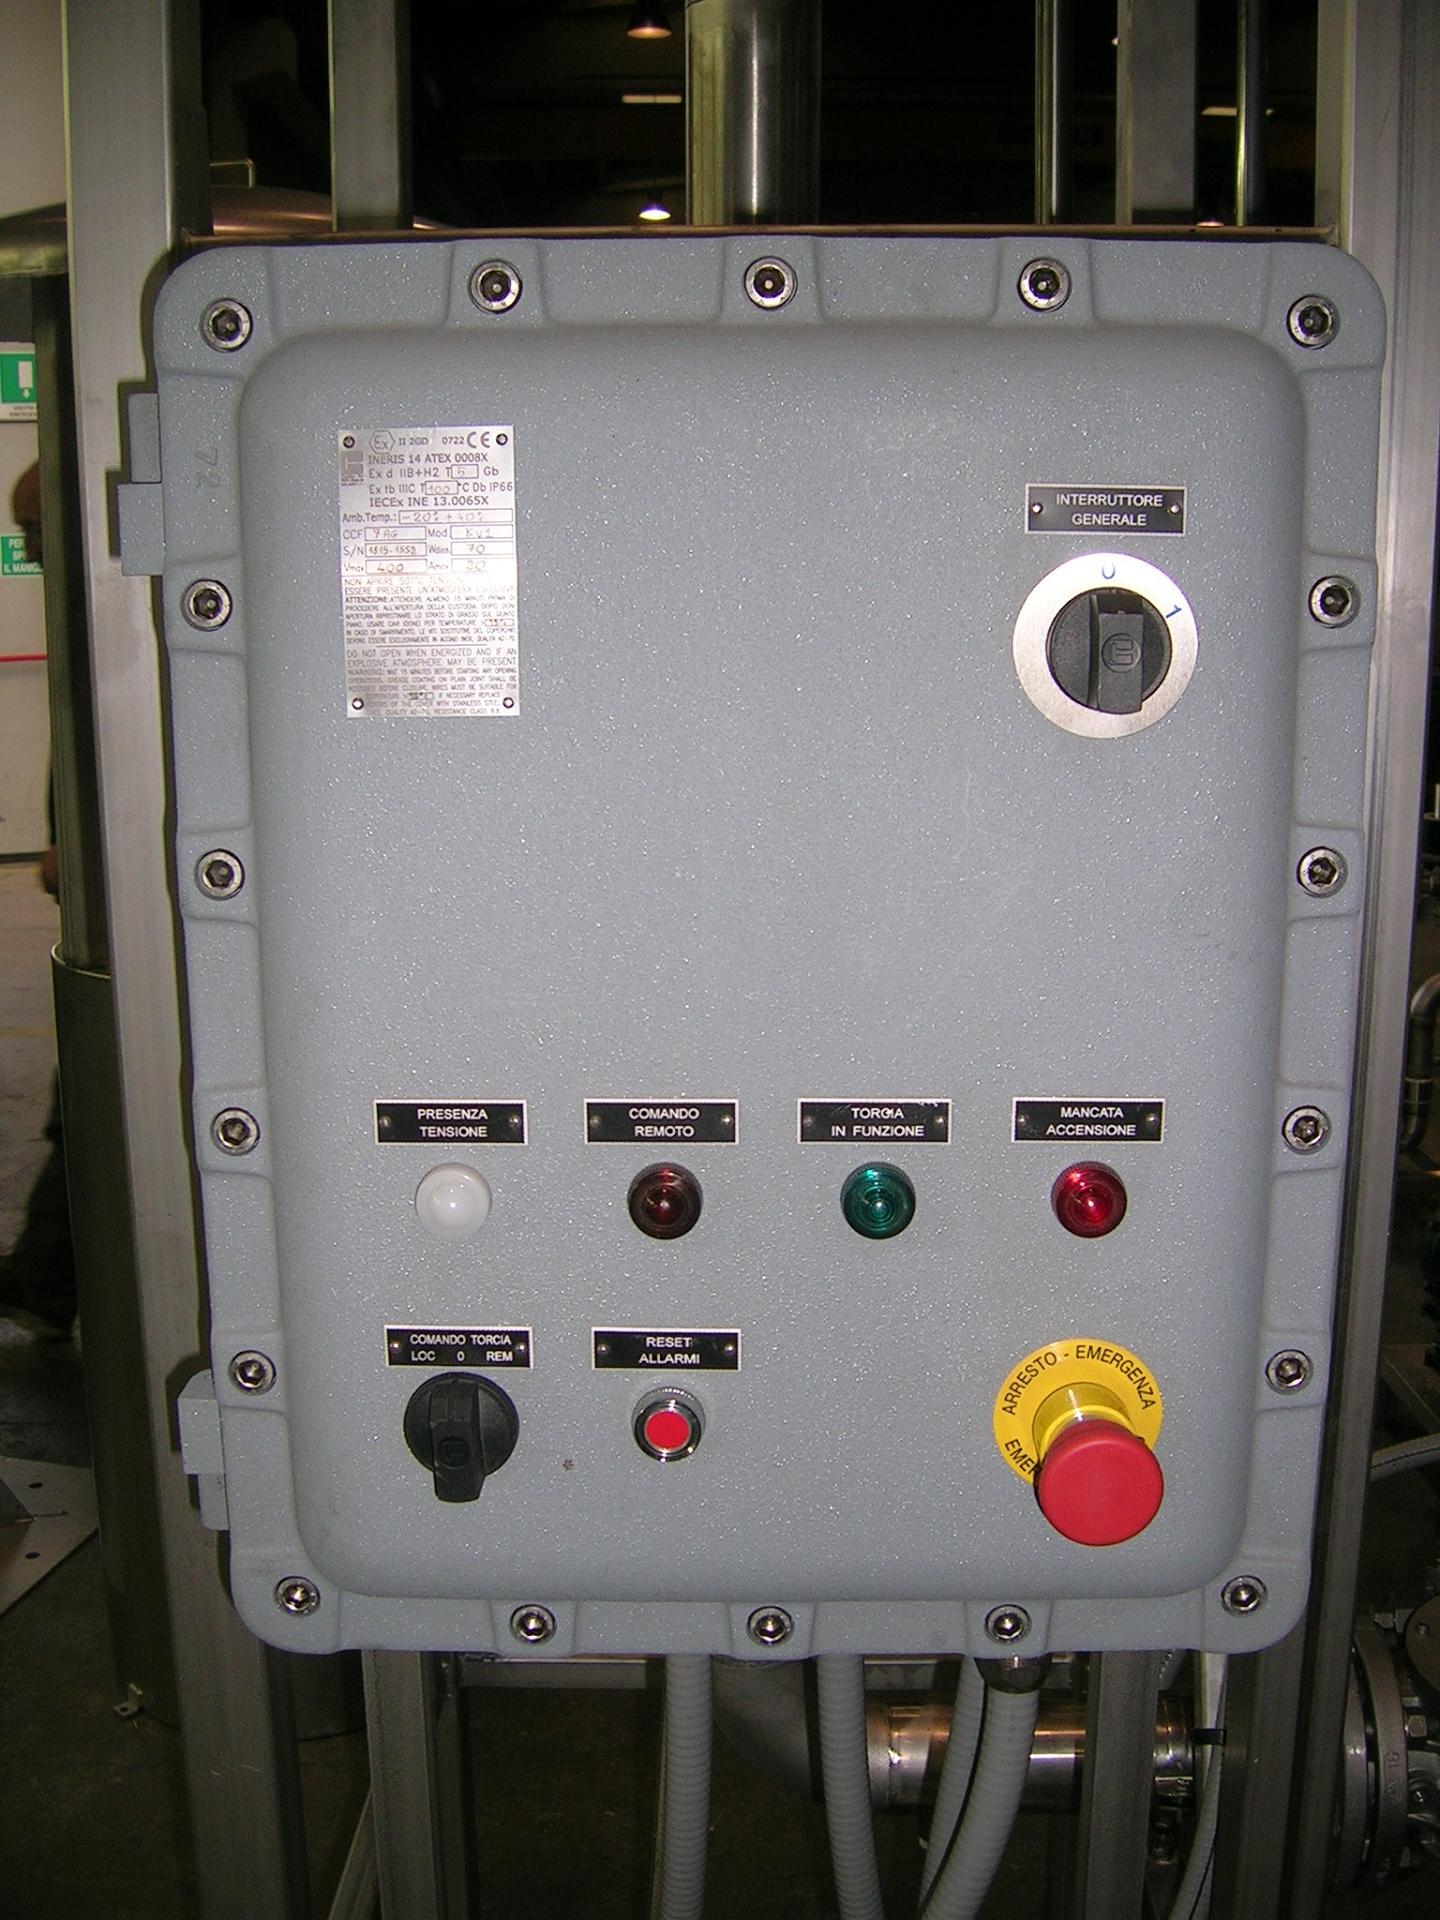 Emr Advanced Biogas Combustion Flare Enclosed Circuit Breaker Enclosure Adv Semi Stacks